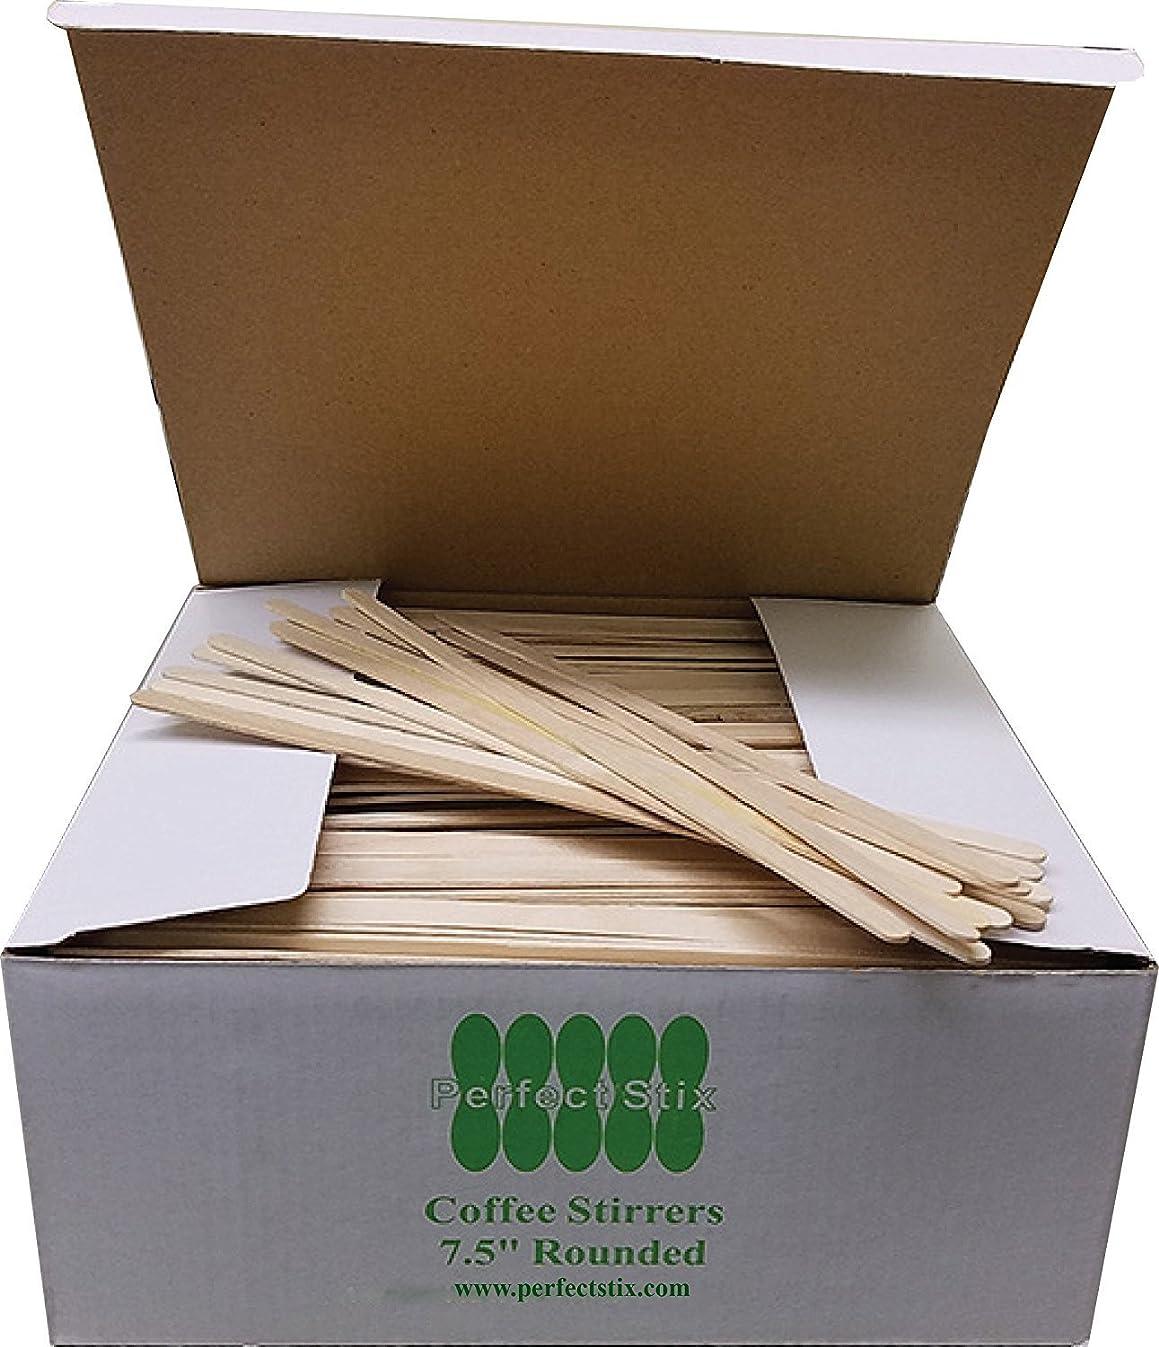 Perfect Stix Wooden Coffee Stirrer Stick, 7-1/2